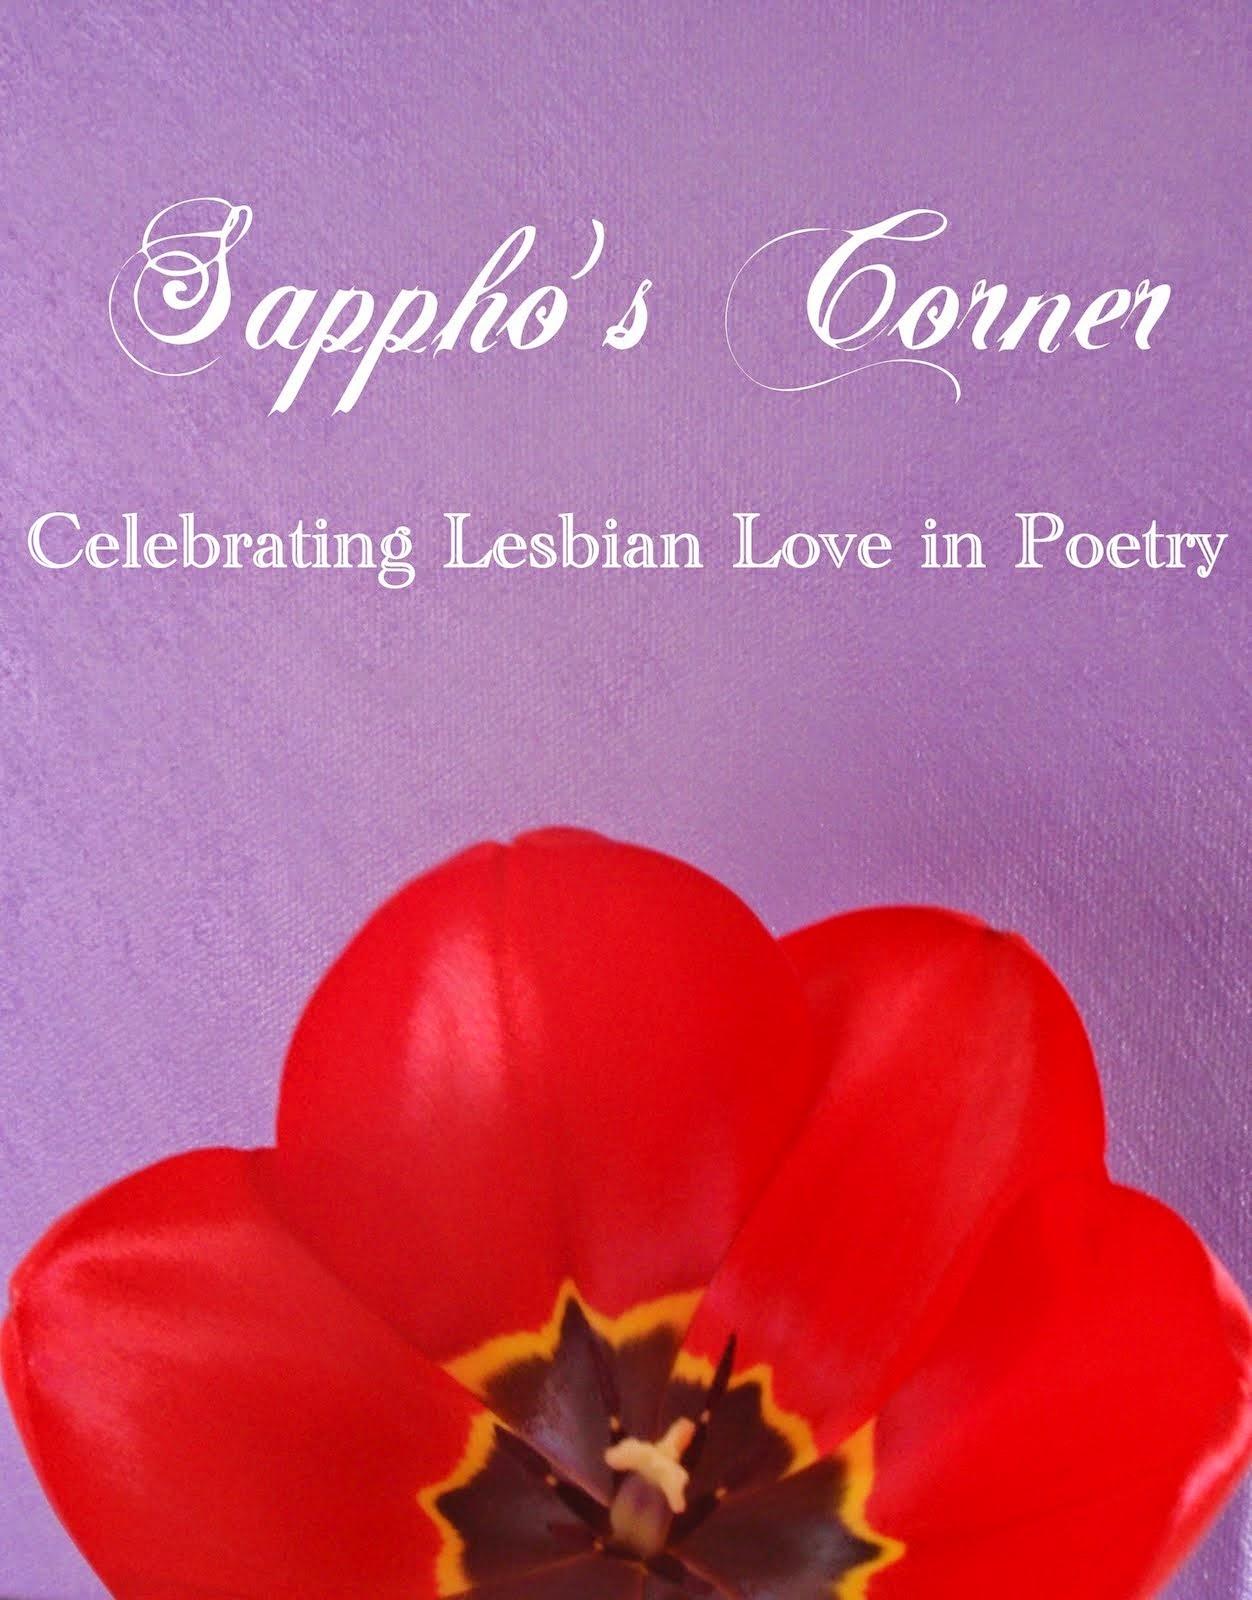 Sappho's Corner